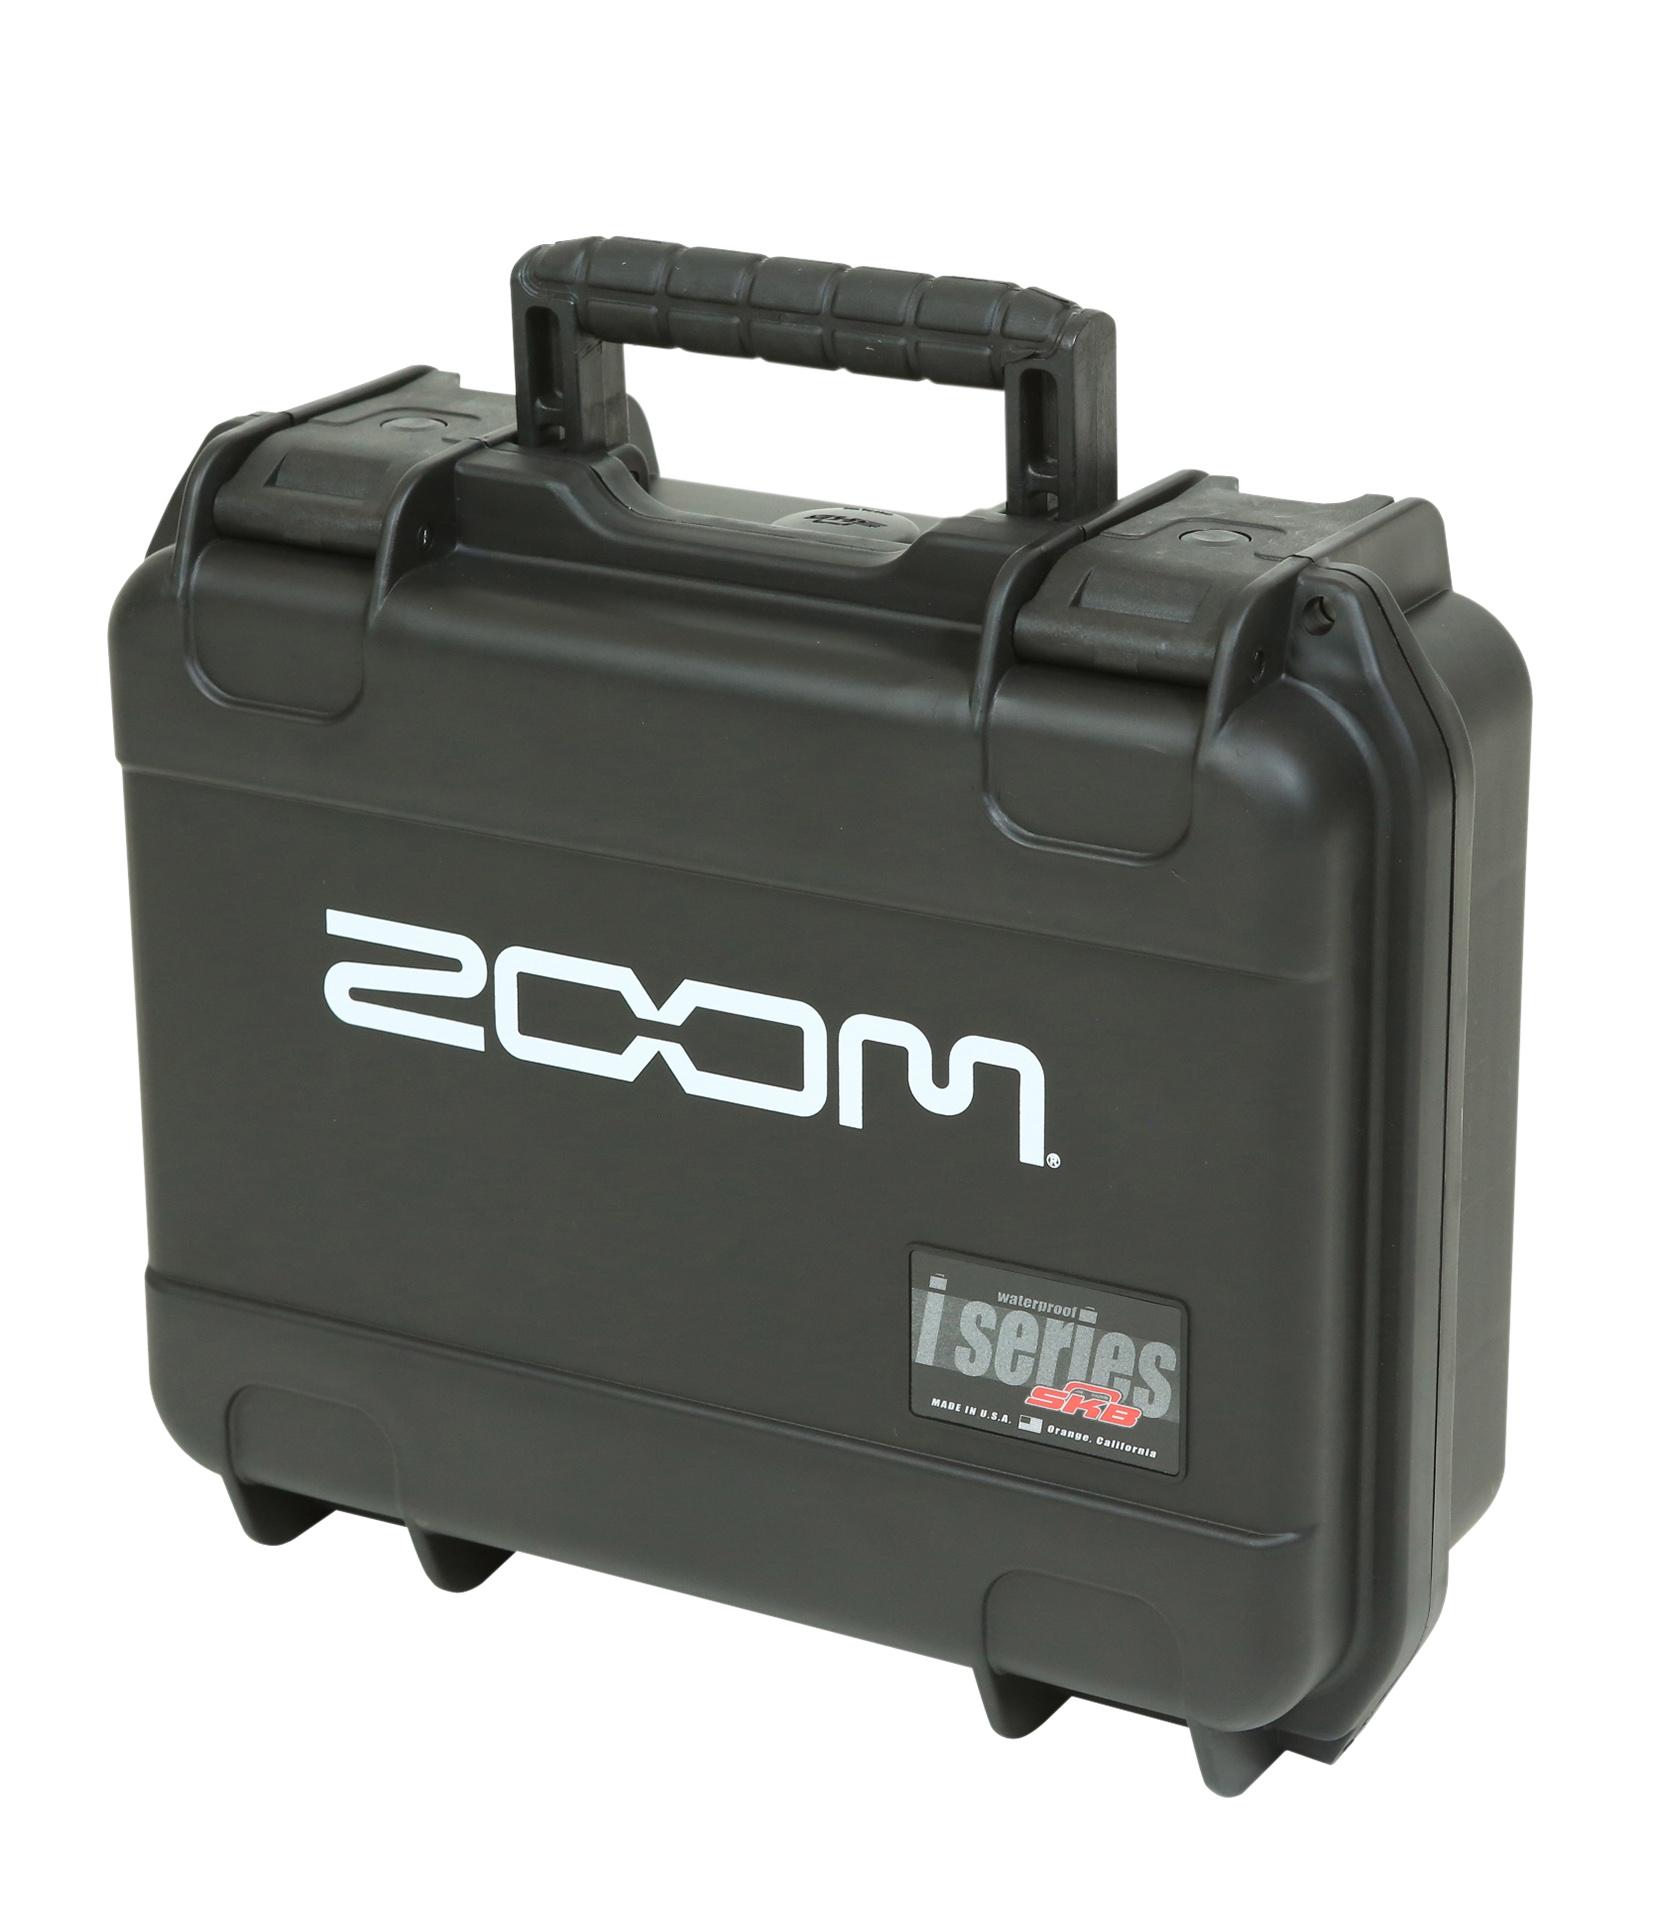 buy skb 3i 1209 4 h6b injection molded case for zoom h6 r